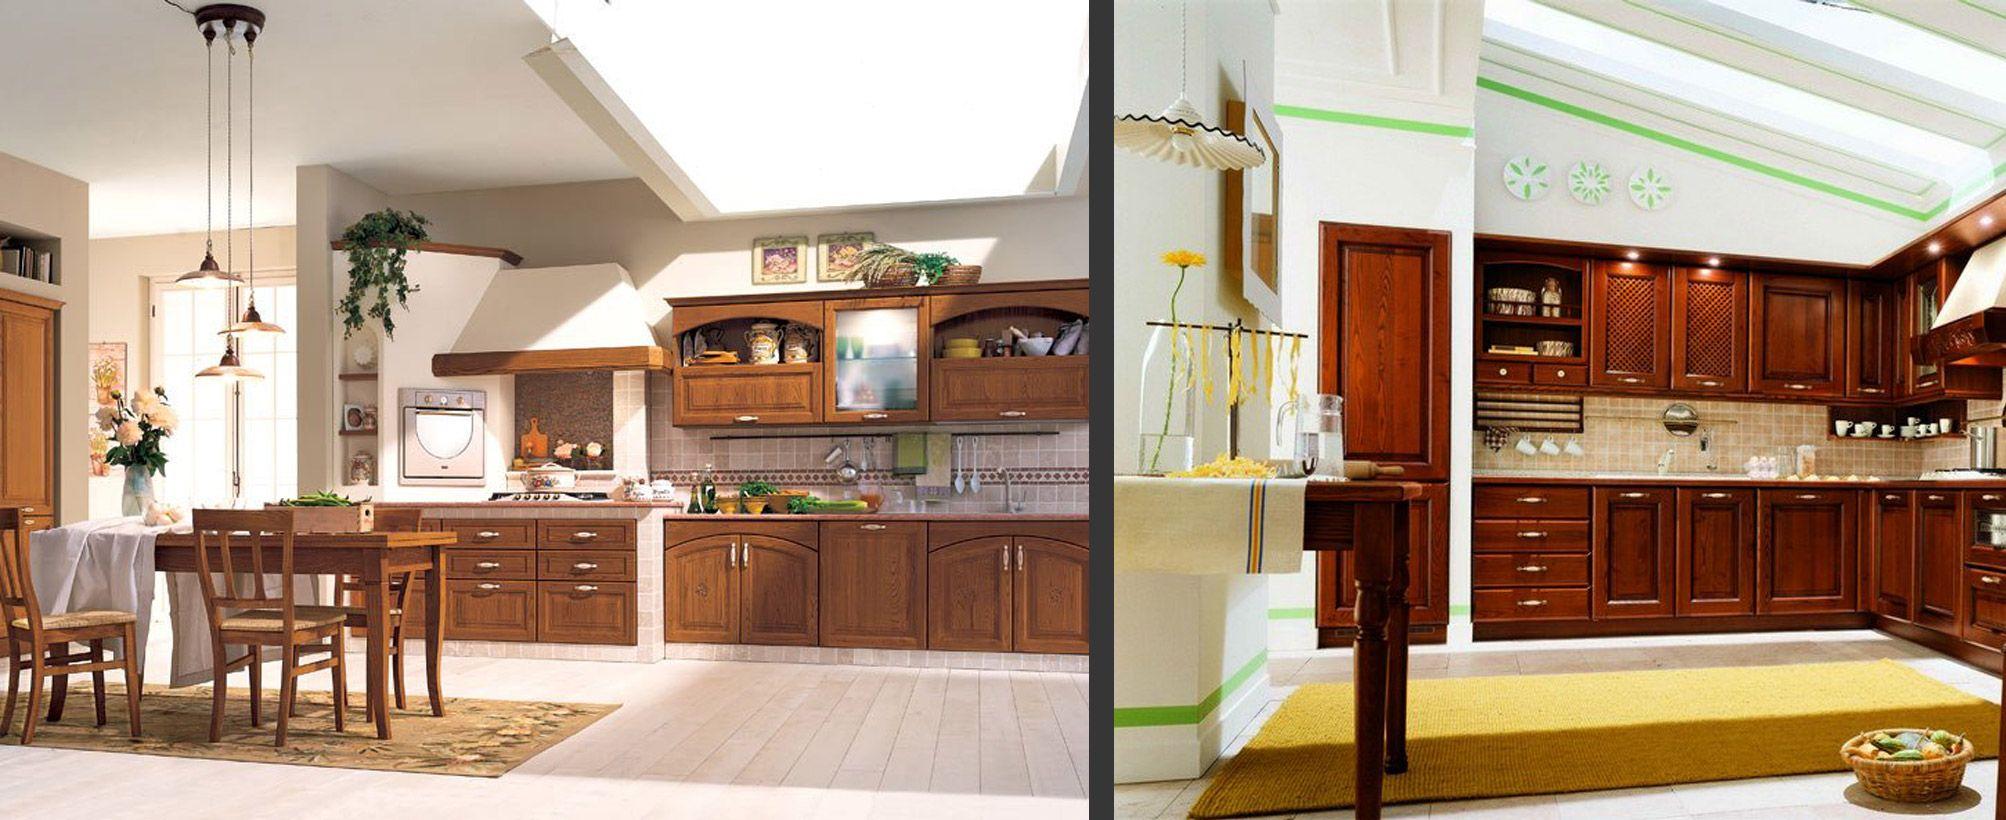 Ingrosso Mobili Vendita di cucine, camere, salotti